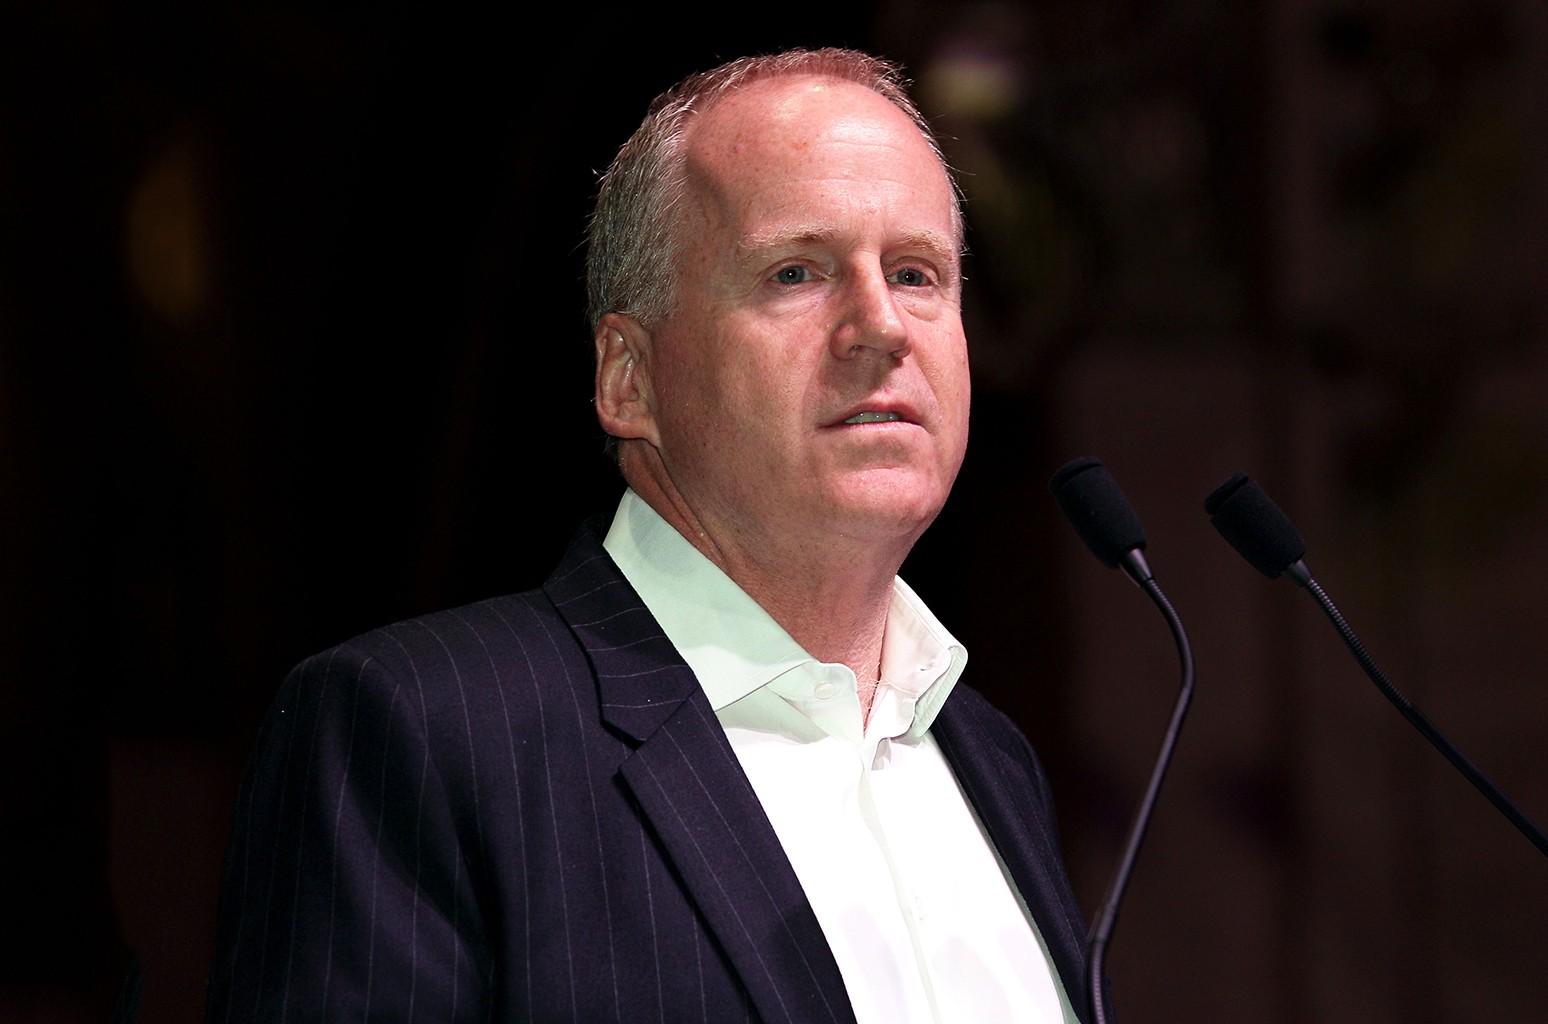 CEO of Madison Square Garden David O'Connor